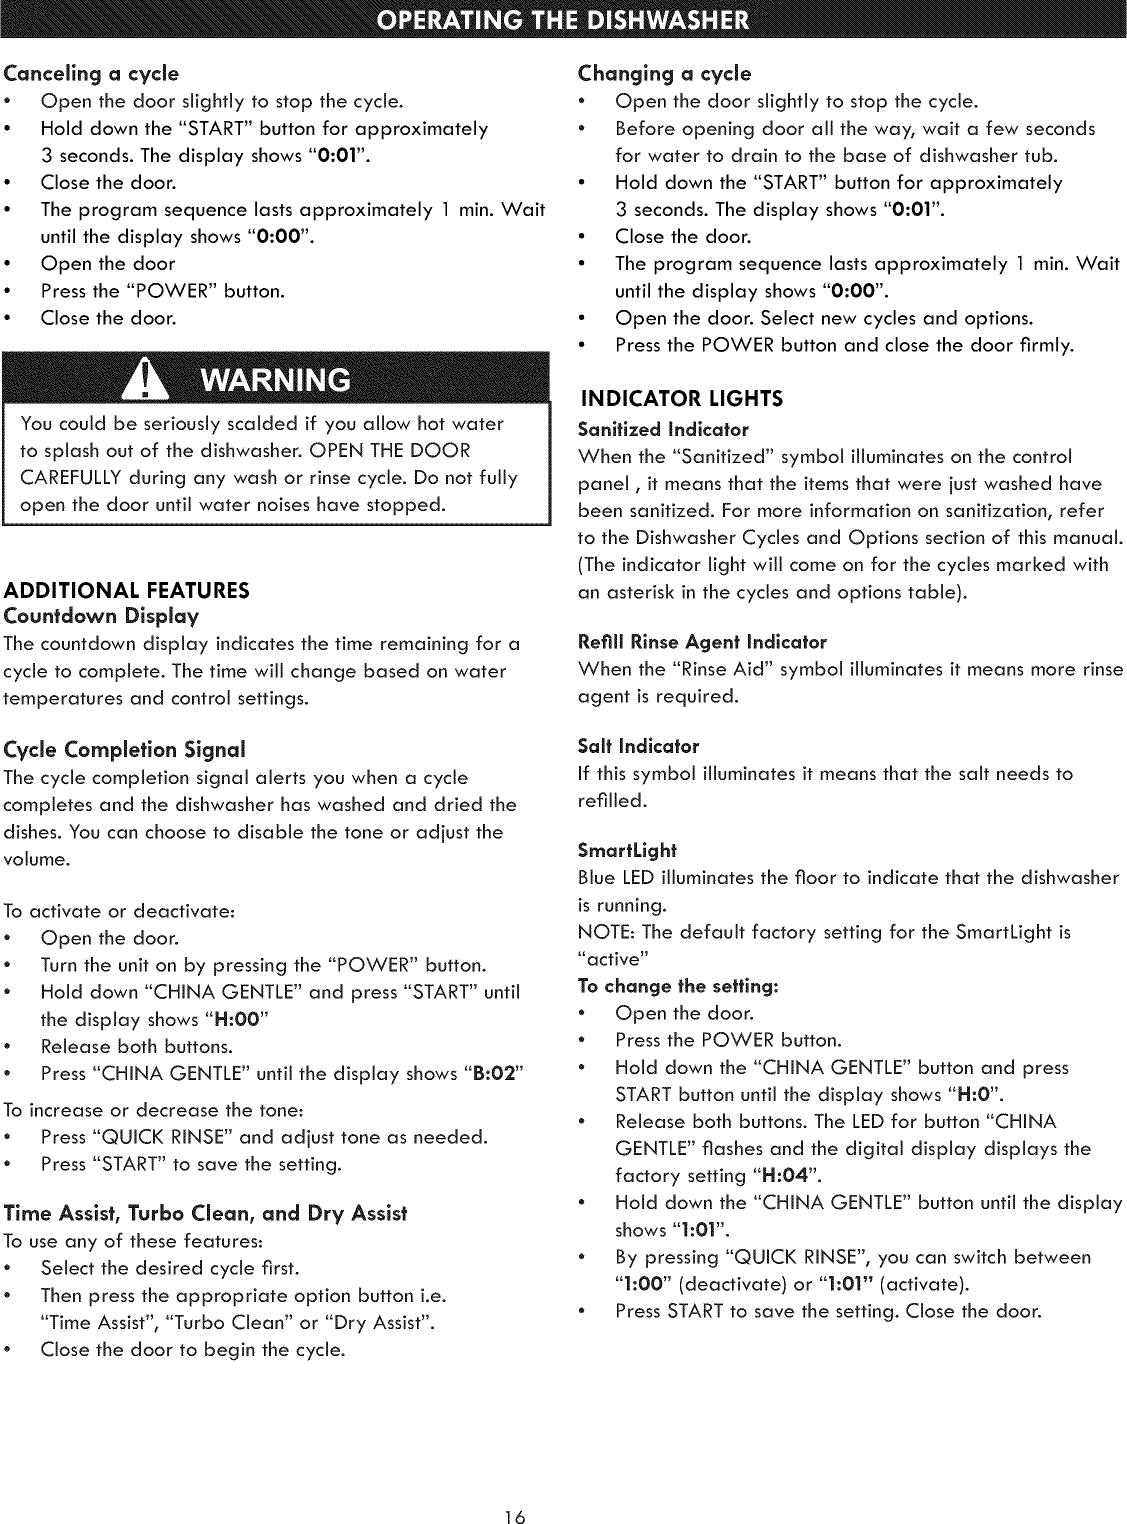 Kenmore Elite 63013993015 User Manual DISHWASHER Manuals And Guides